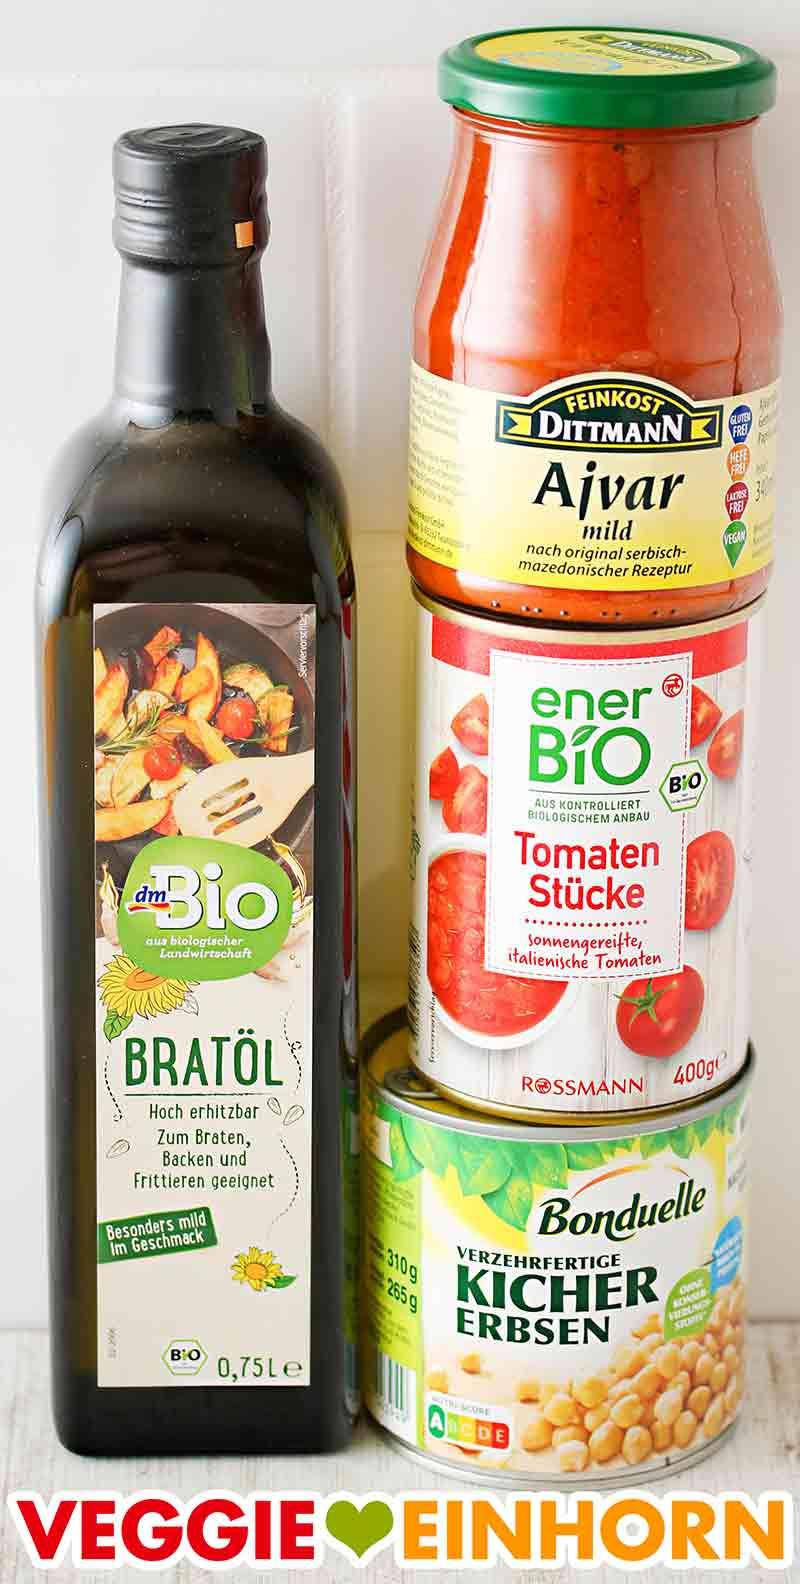 Bratöl, Ajvar, Tomaten aus der Dose, Kichererbsen